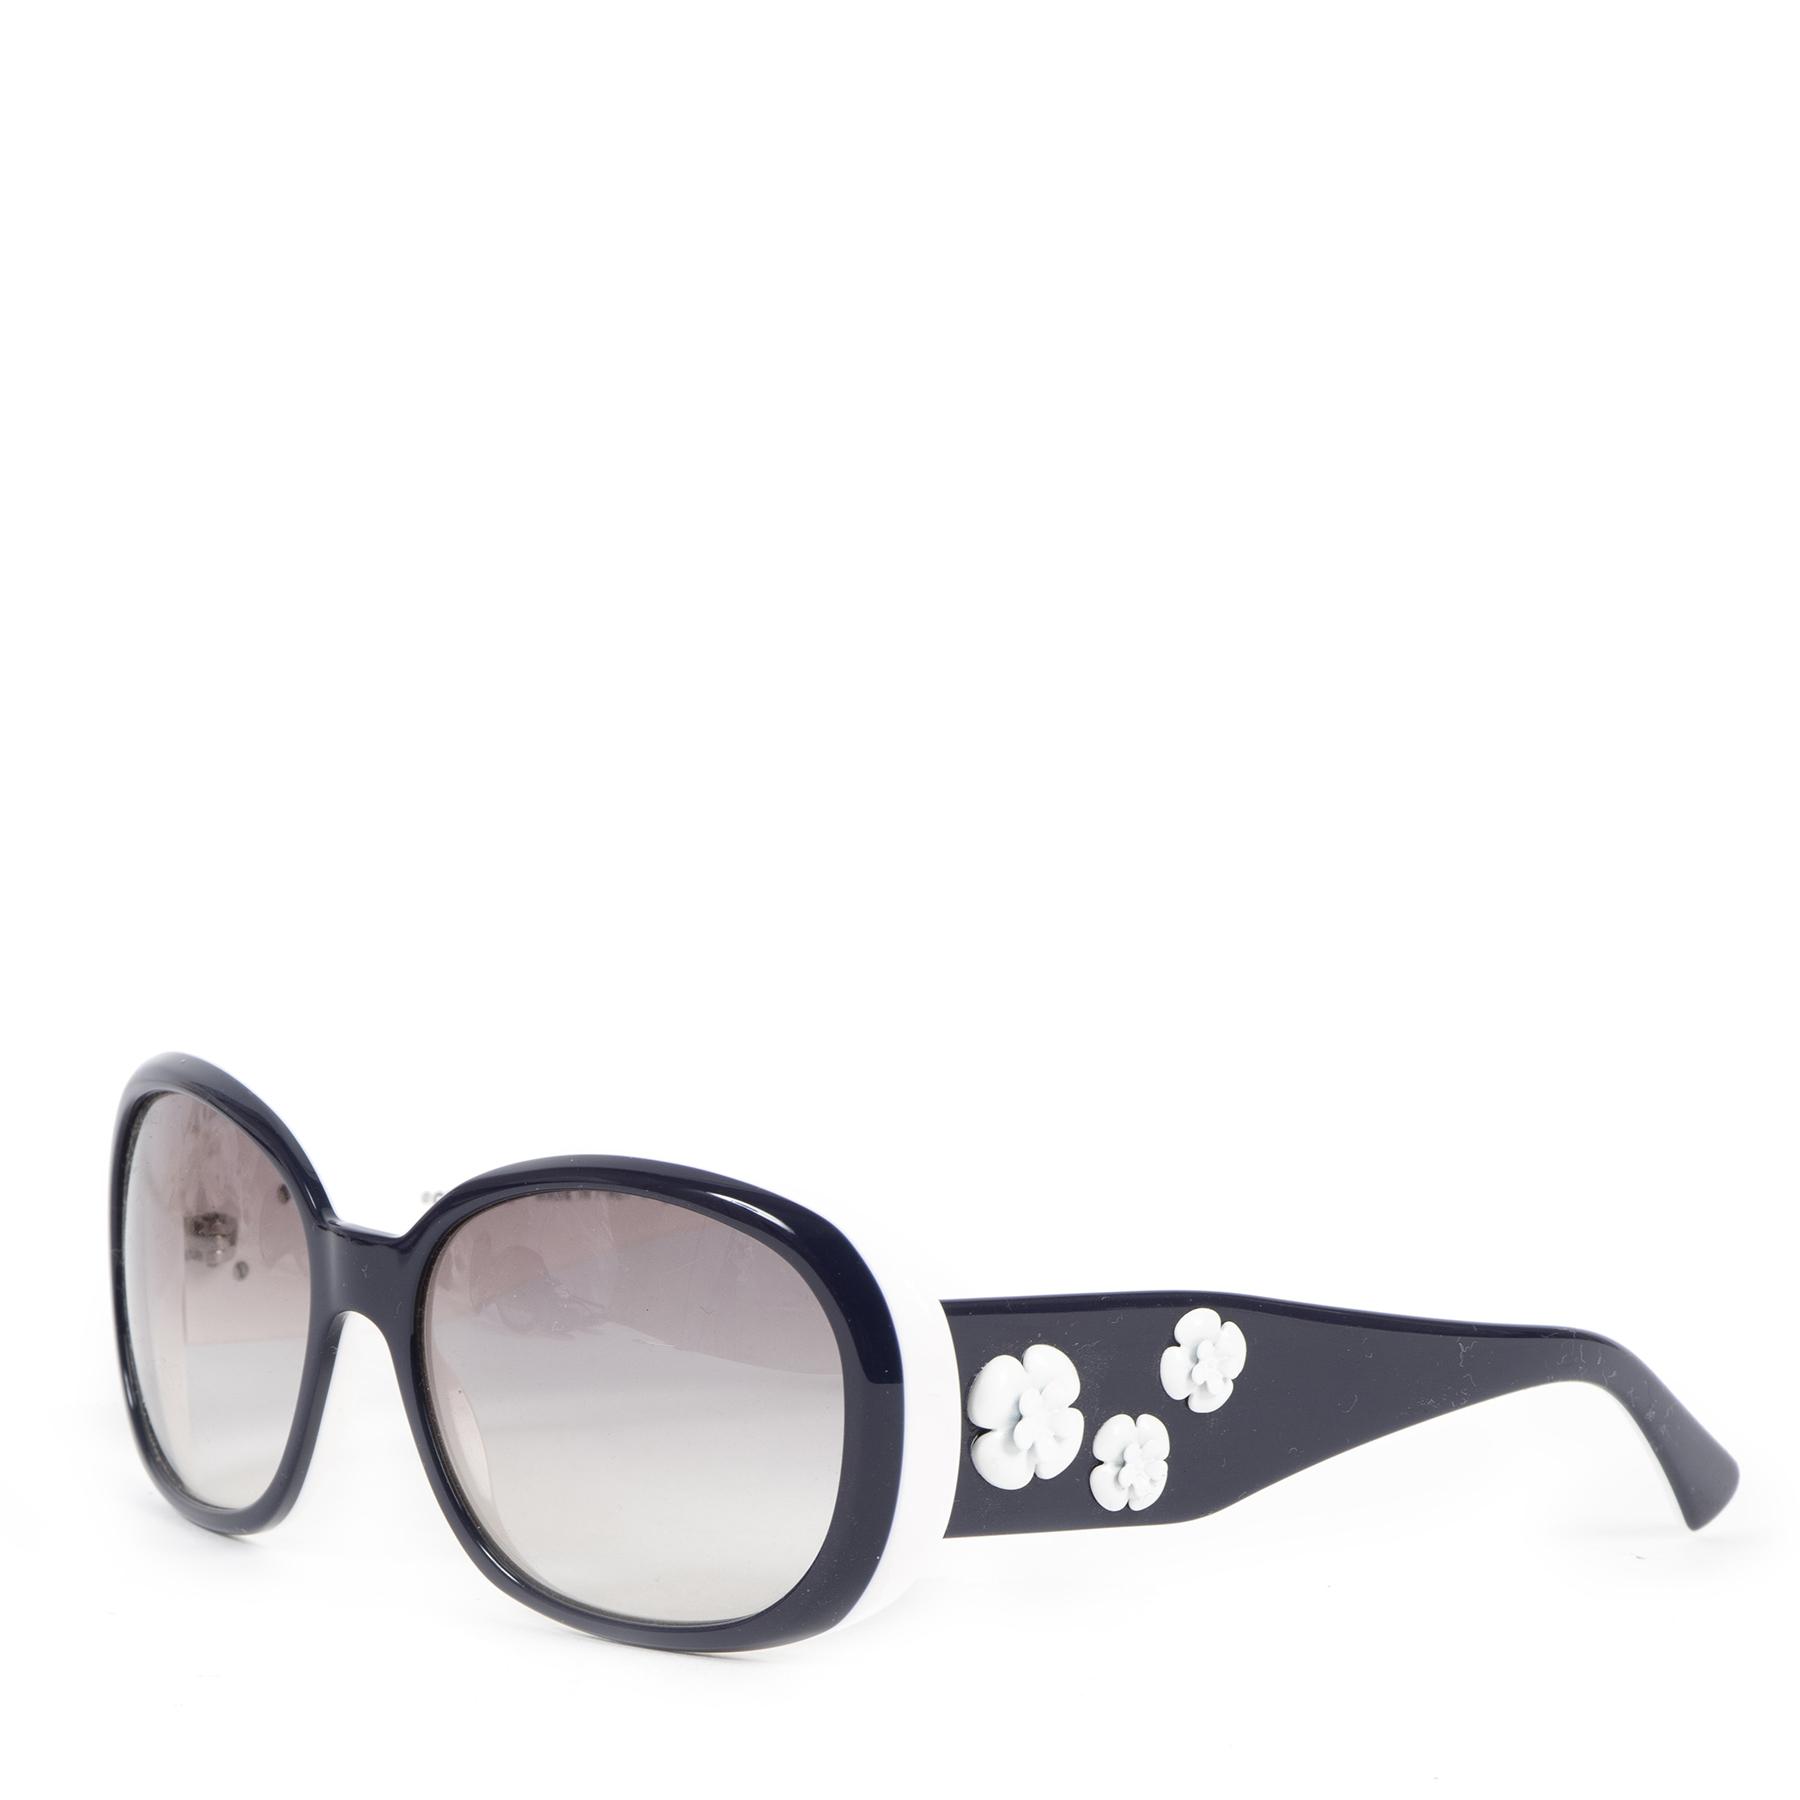 Authentieke Tweedehands Chanel White Blue Frame Camellia Flower Sunglasses juiste prijs veilig online shoppen luxe merken webshop winkelen Antwerpen België mode fashion